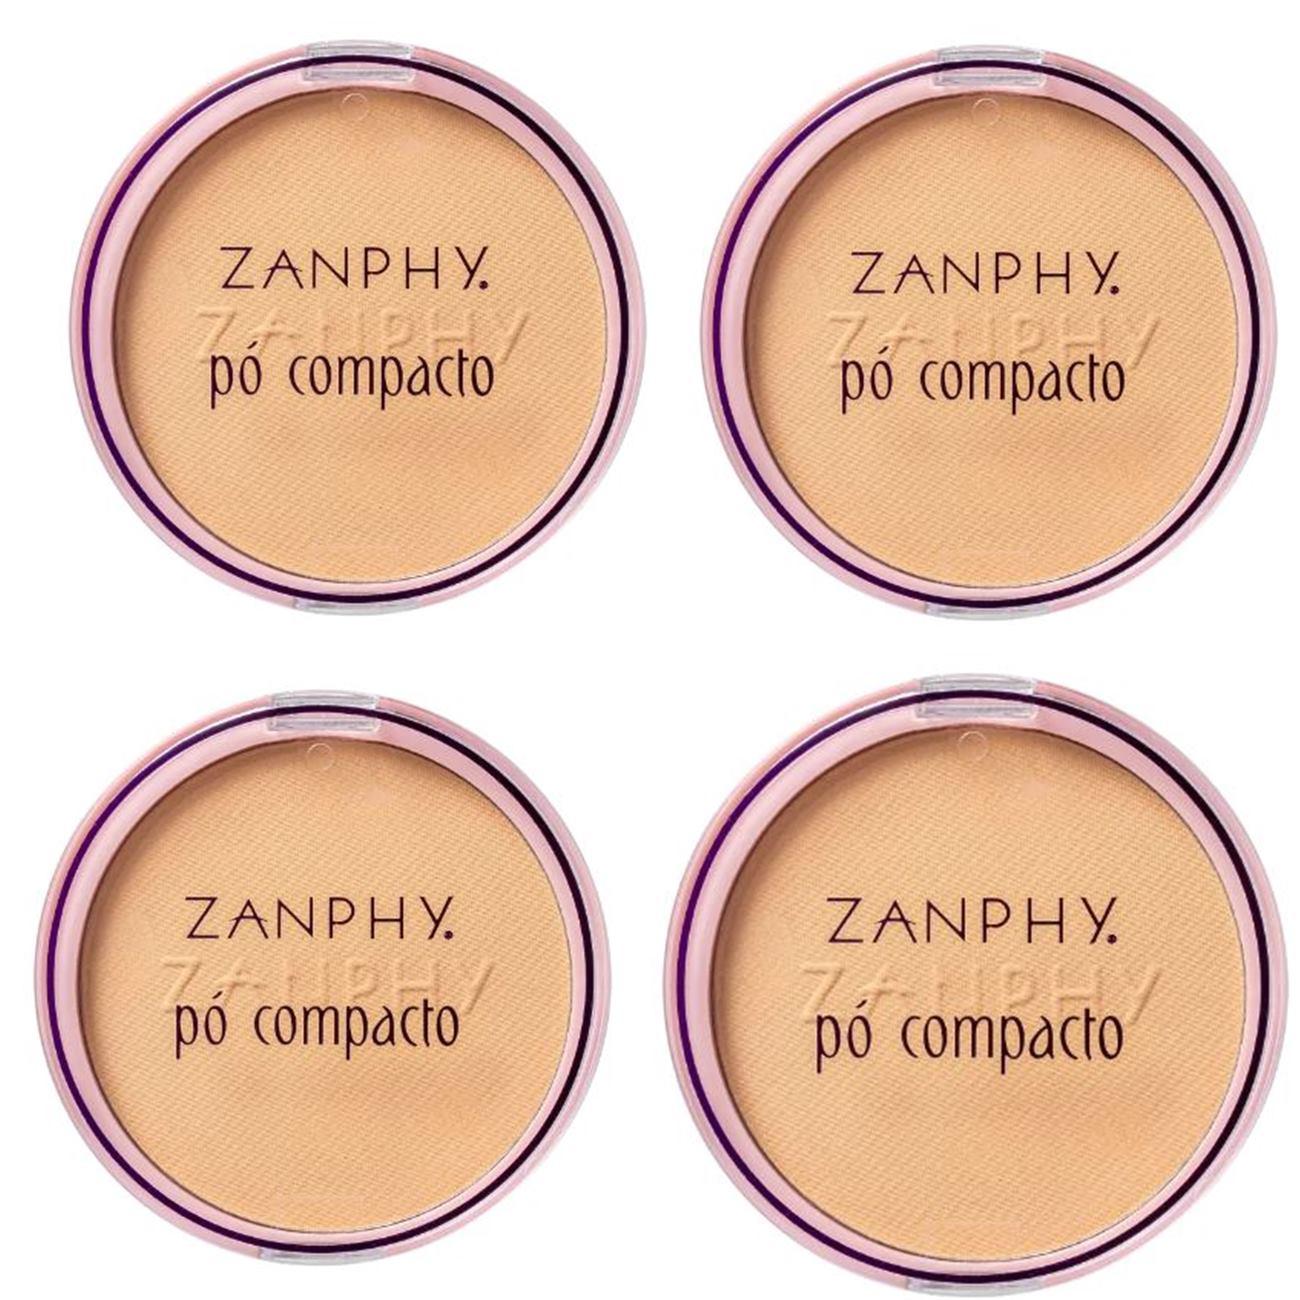 Pó Compacto - Zanphy